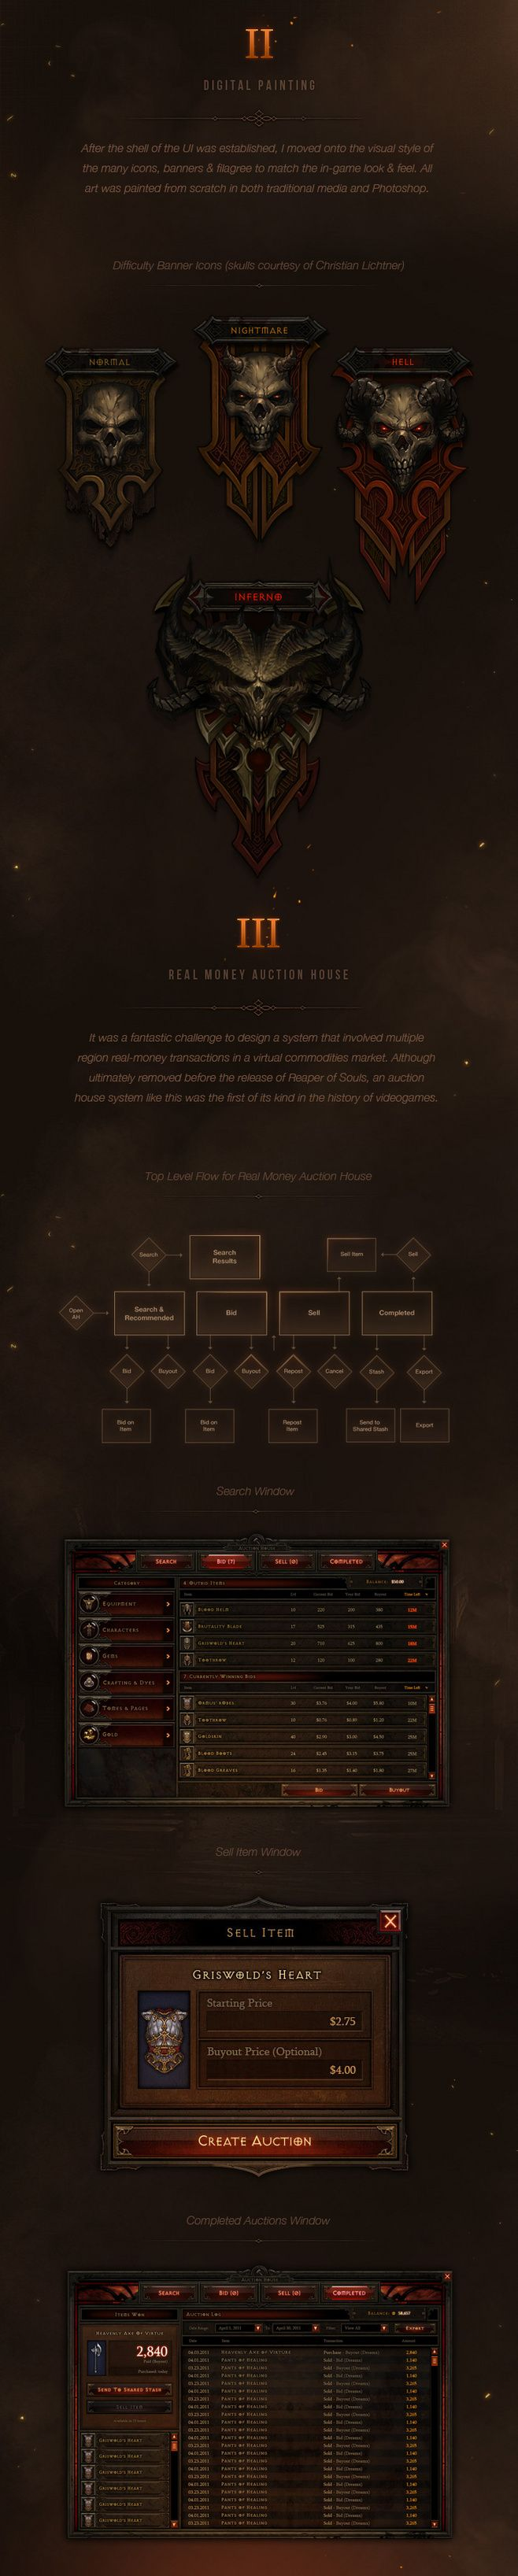 Diablo III UI Art & ...